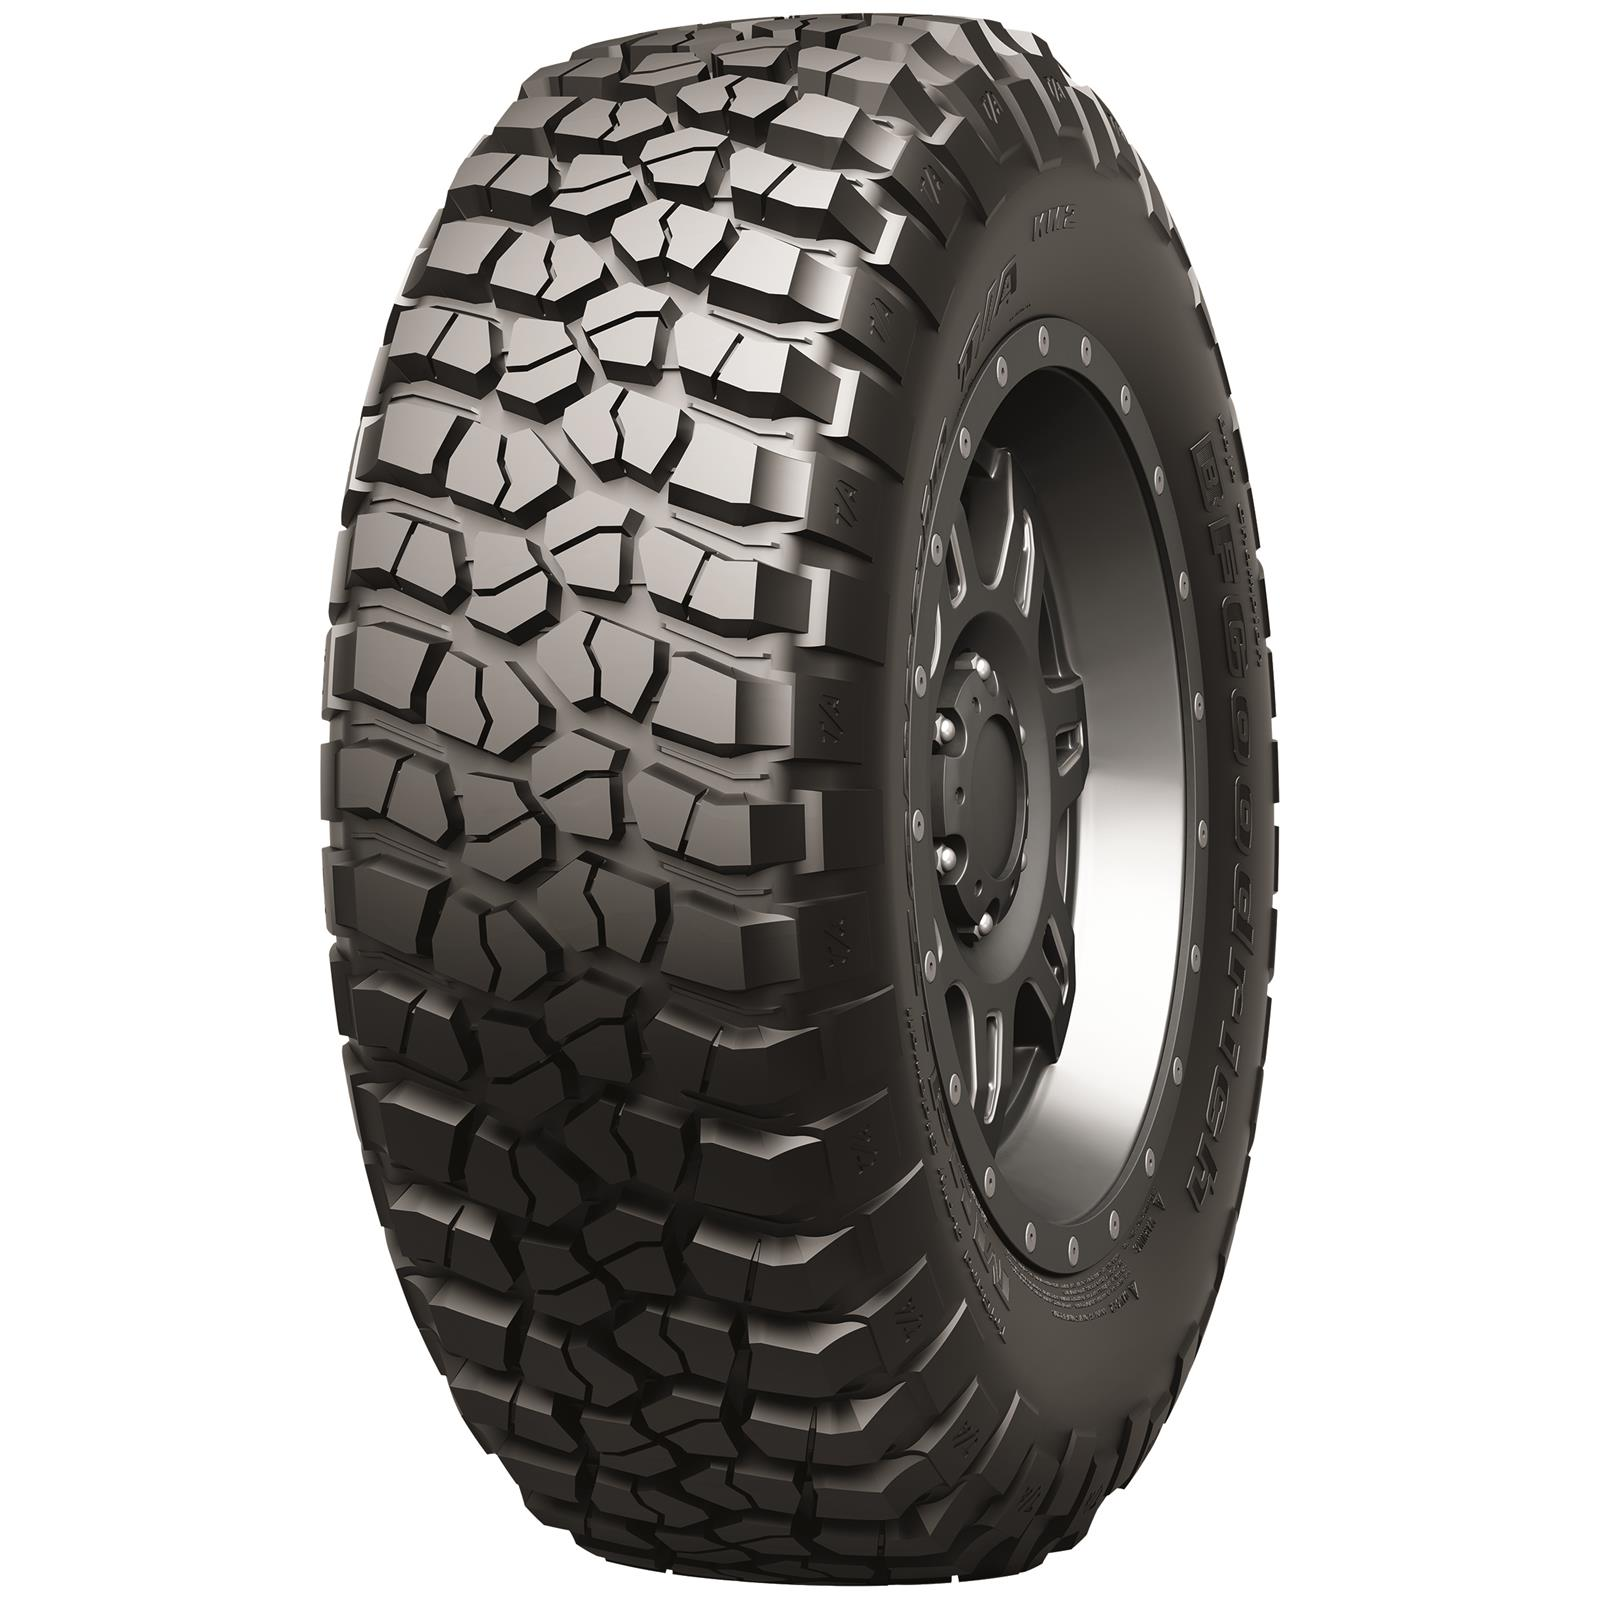 BFGoodrich Mud Terrain T A KM2 Tires Free Shipping on Orders